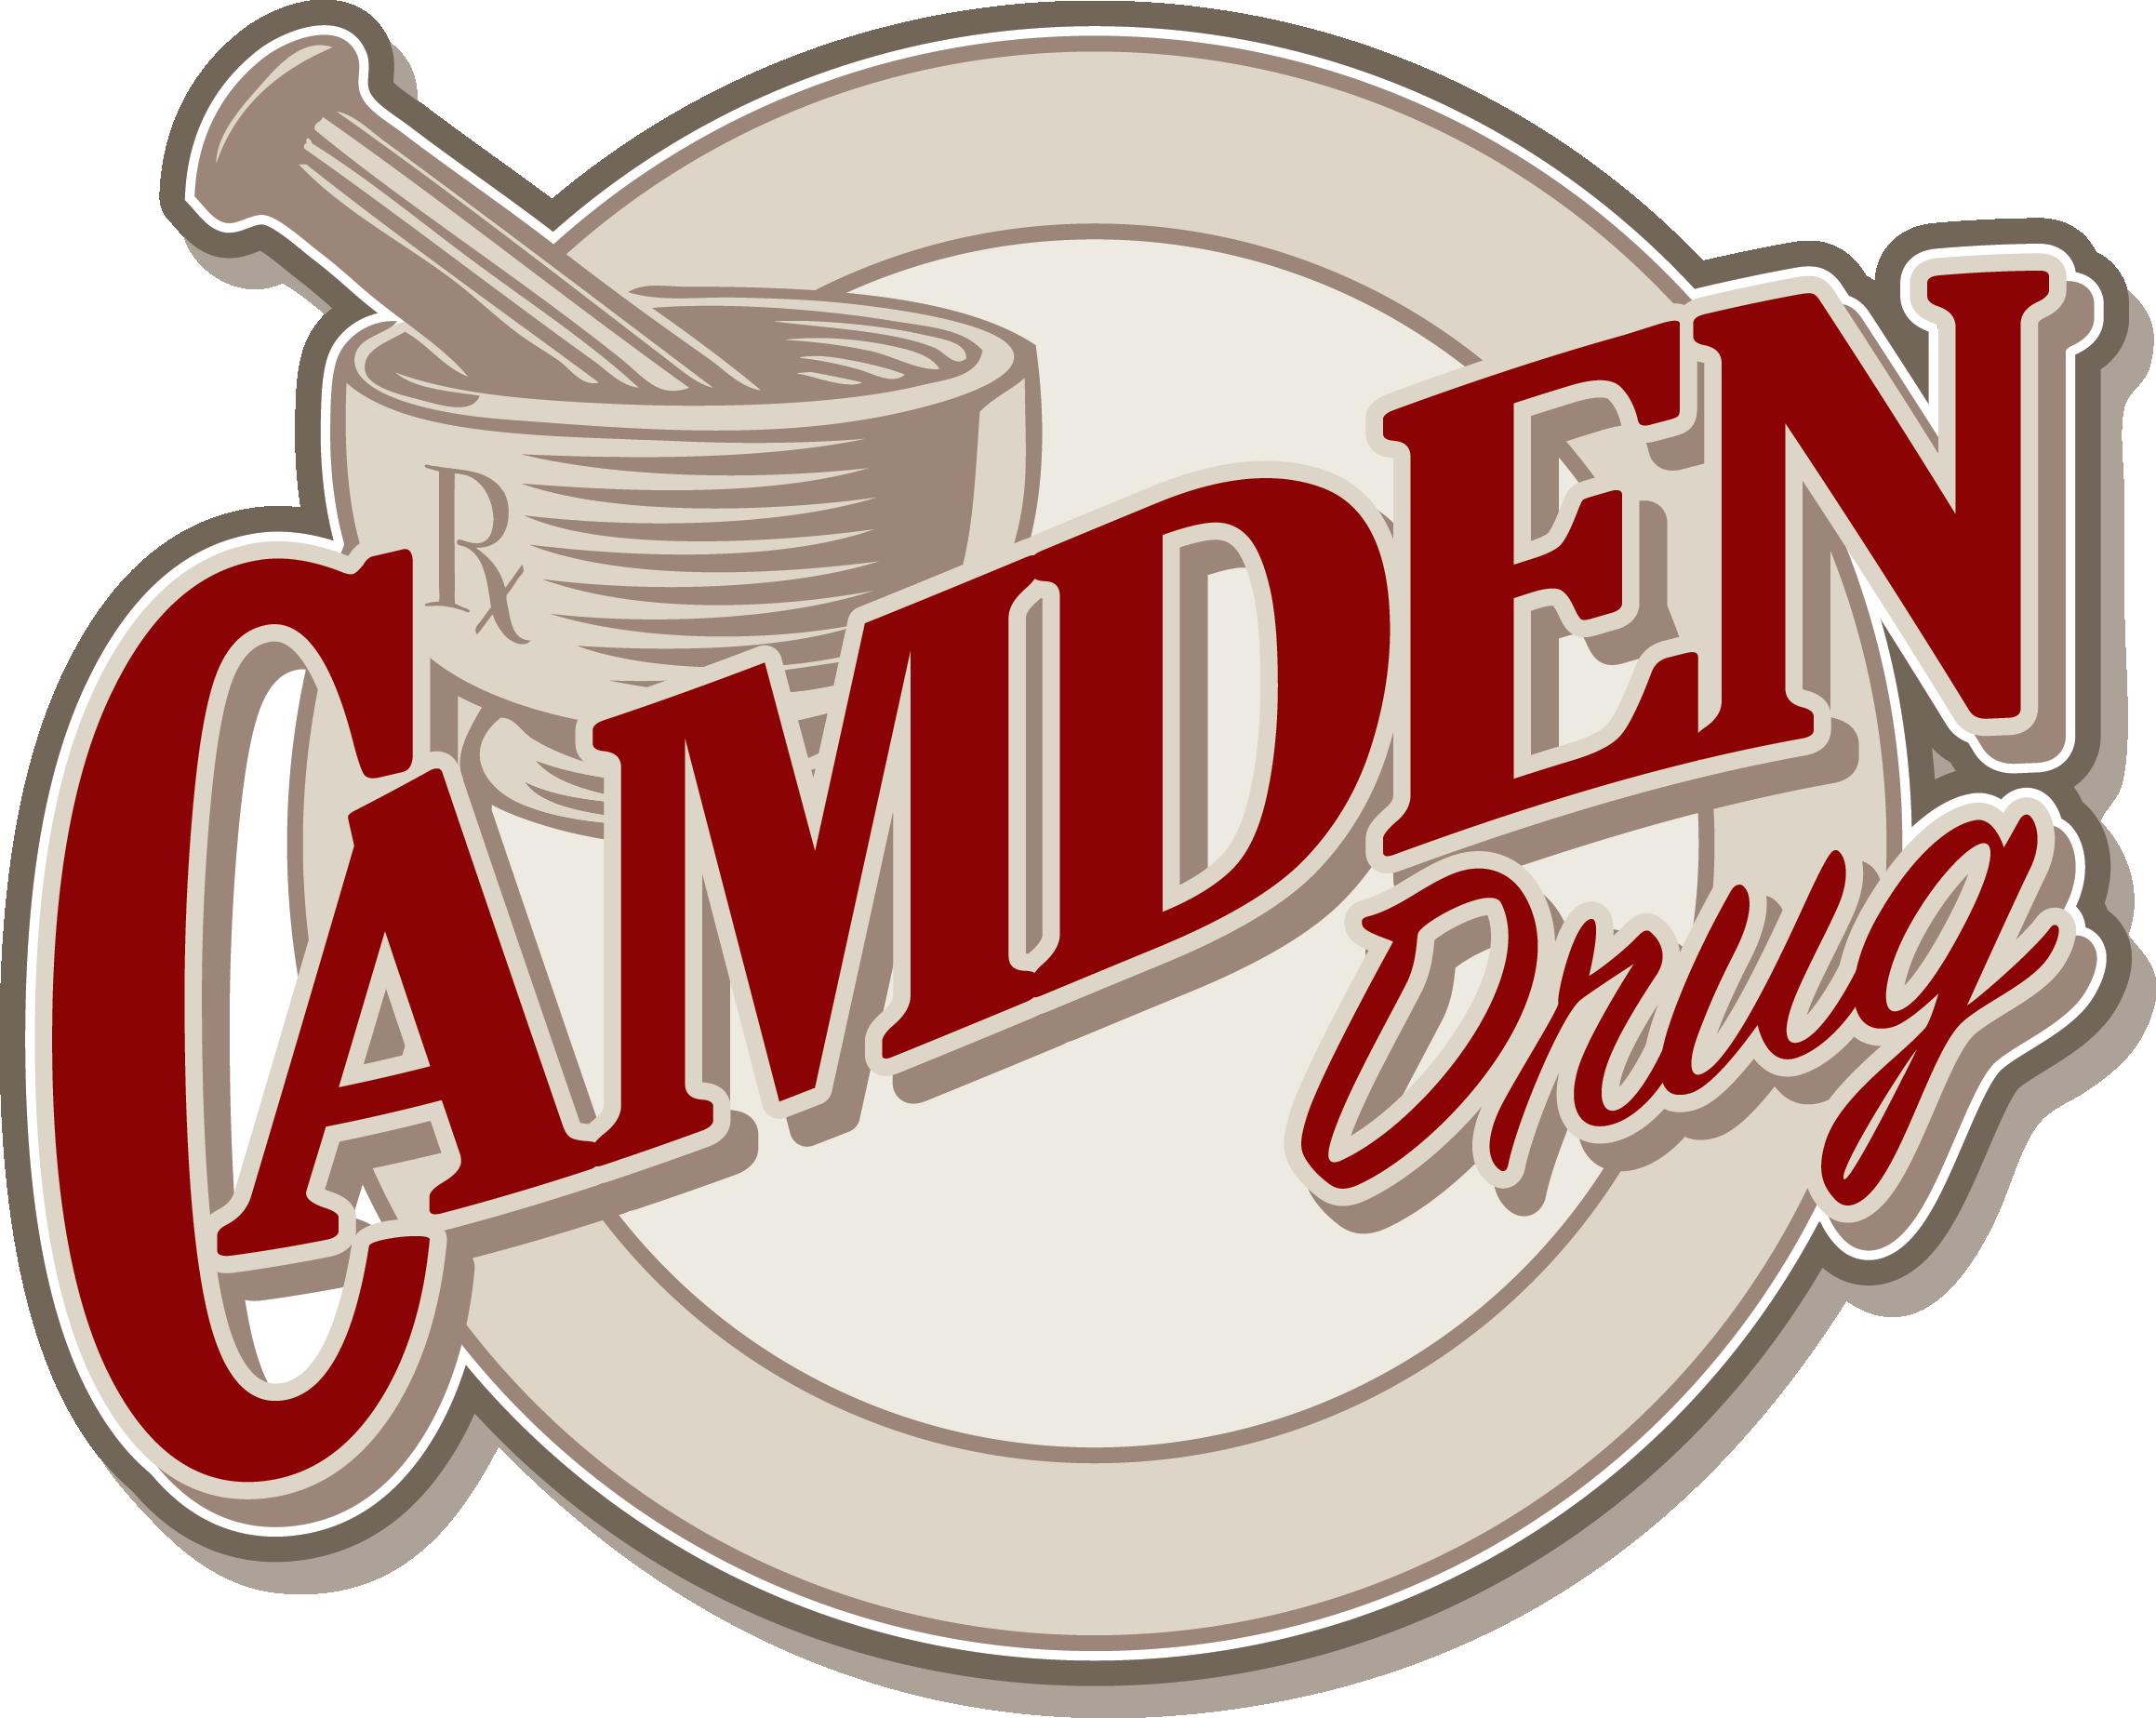 Camden Drug